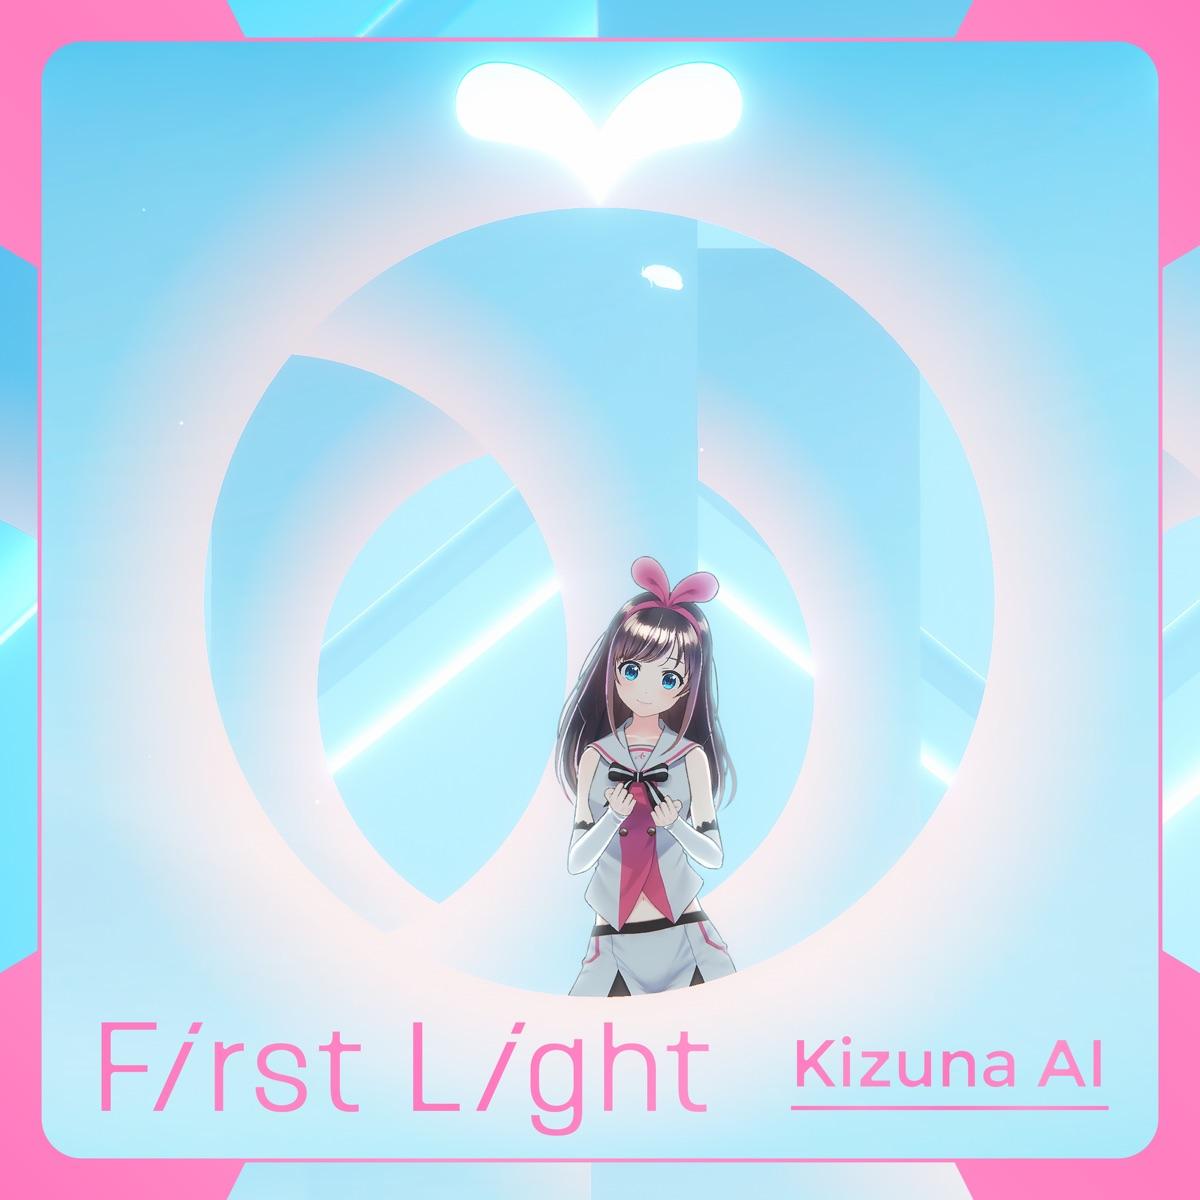 『Kizuna AI (キズナアイ) - First Light』収録の『First Light』ジャケット